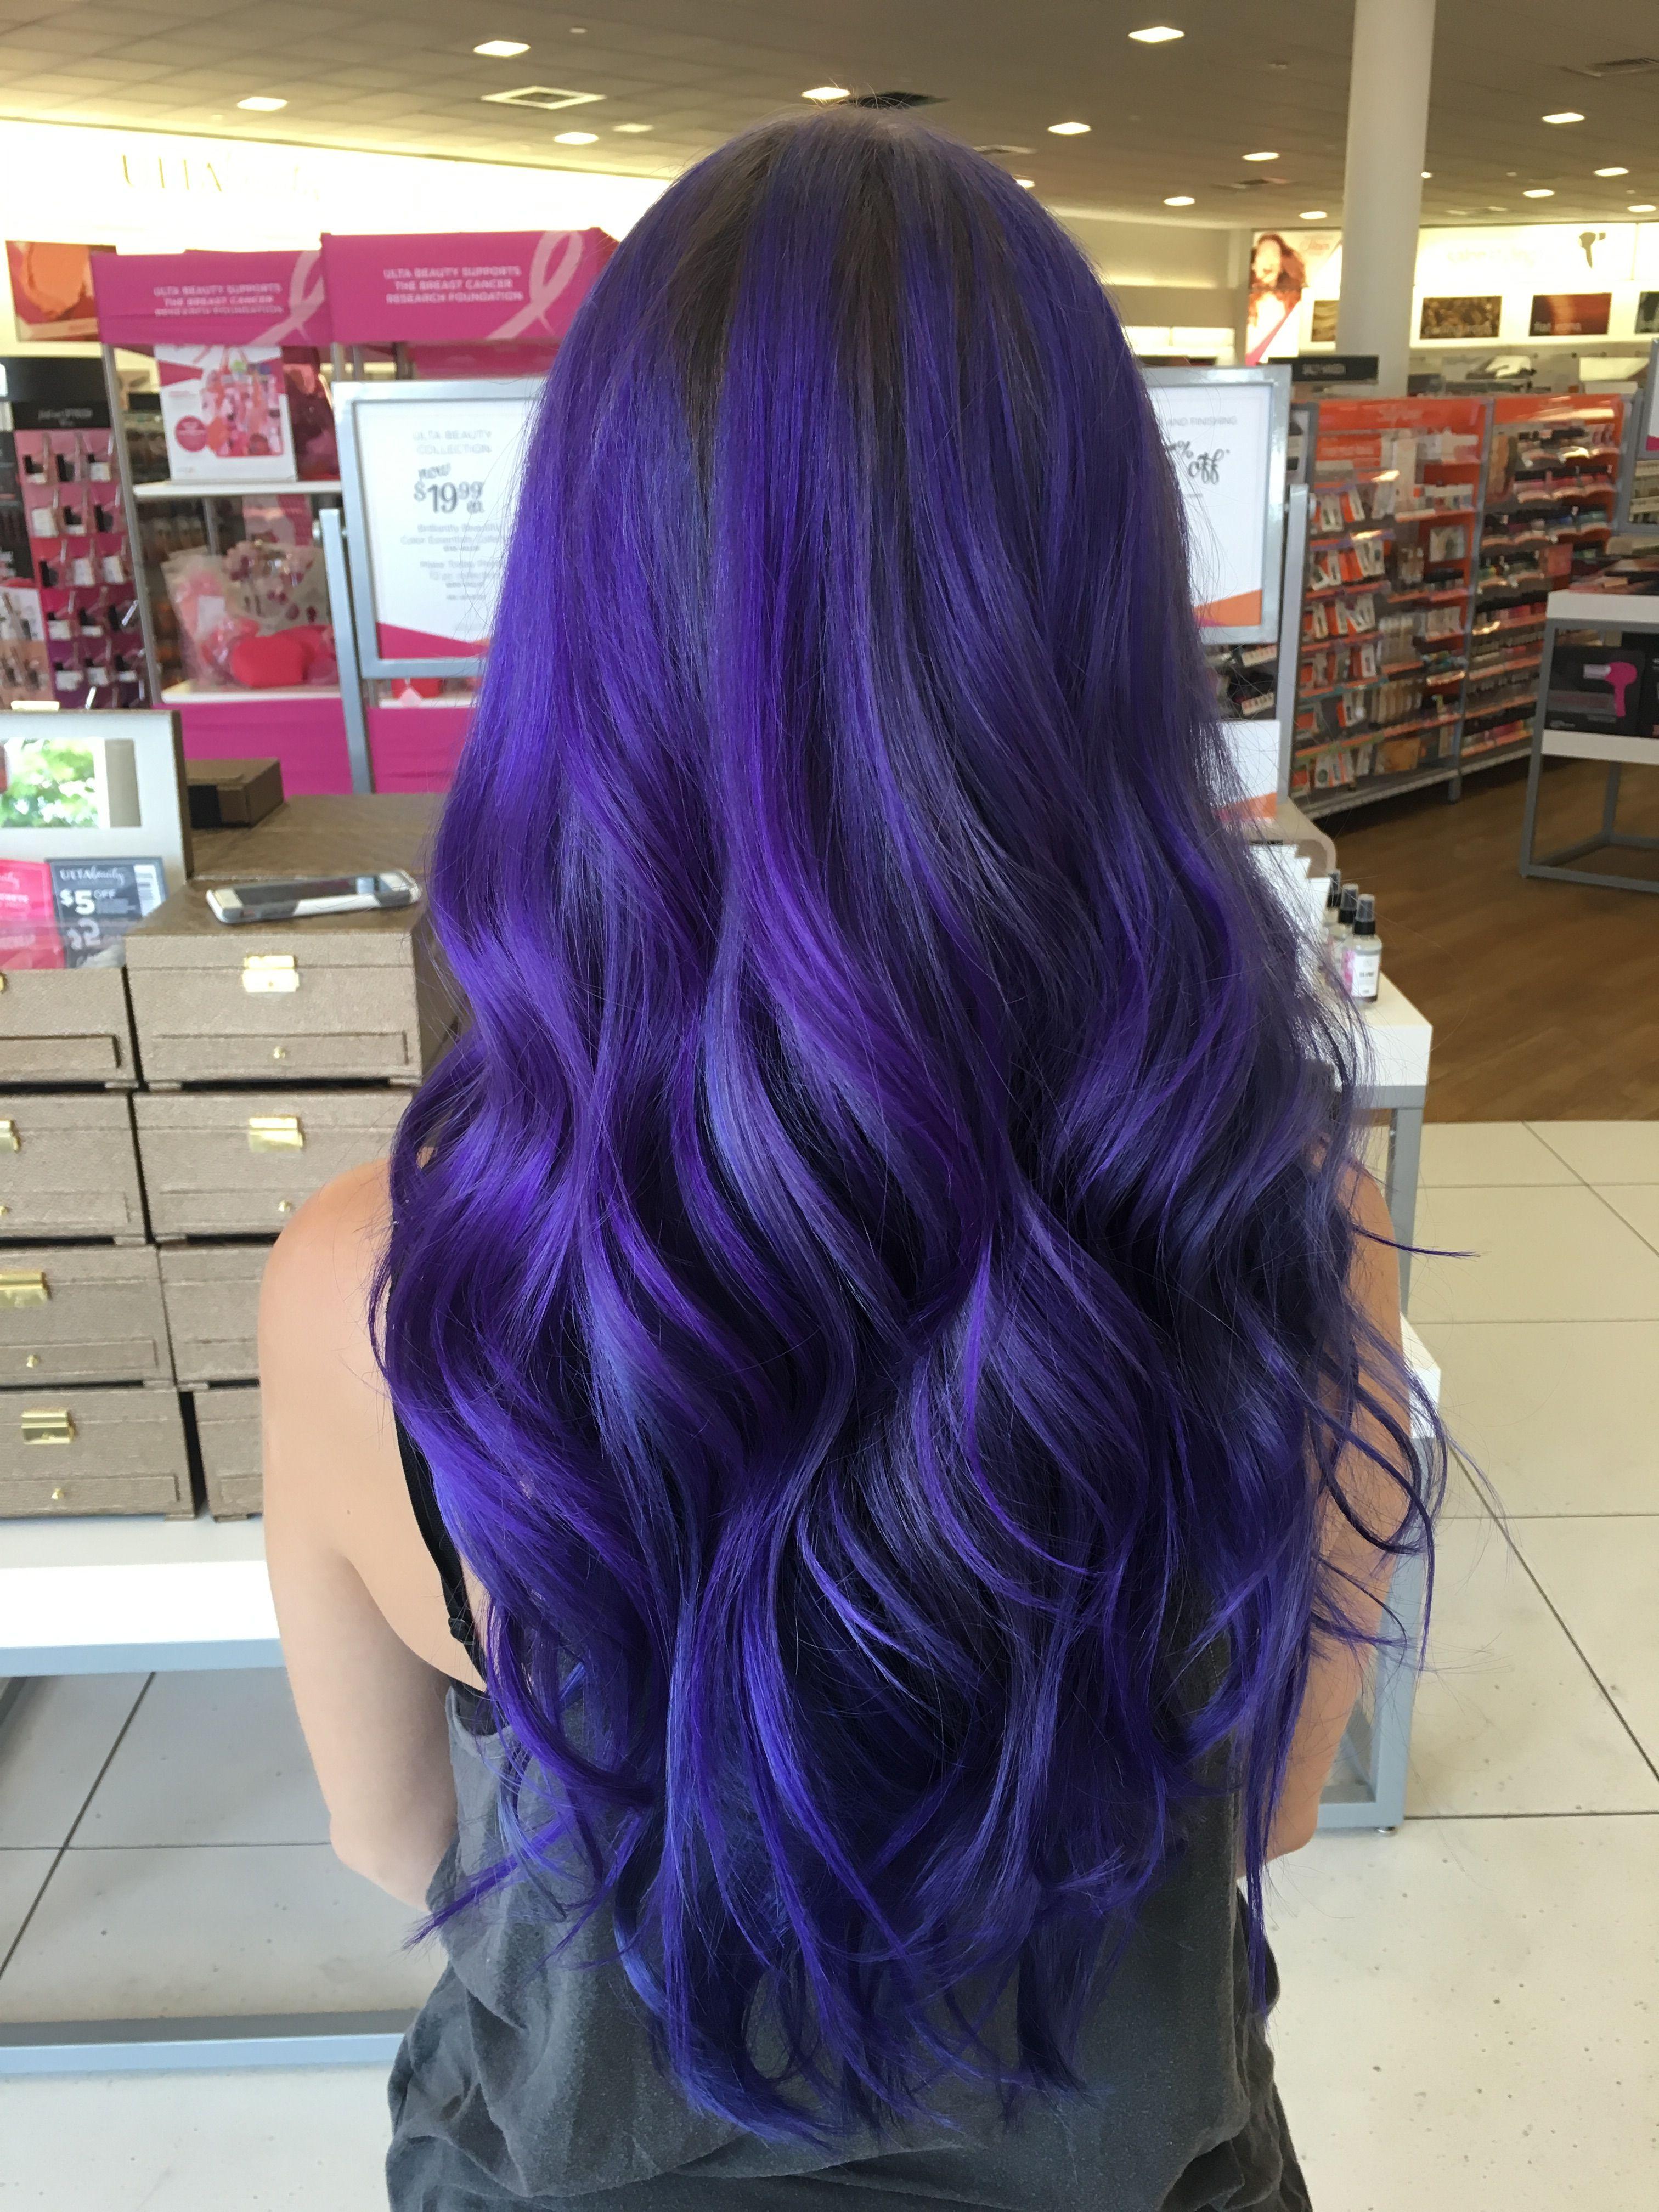 Indigo Purple Blue Hair Done With A Mix Of Pravana Vivids And Redken City Color Indigo Hair Hair Styles Blue Purple Hair